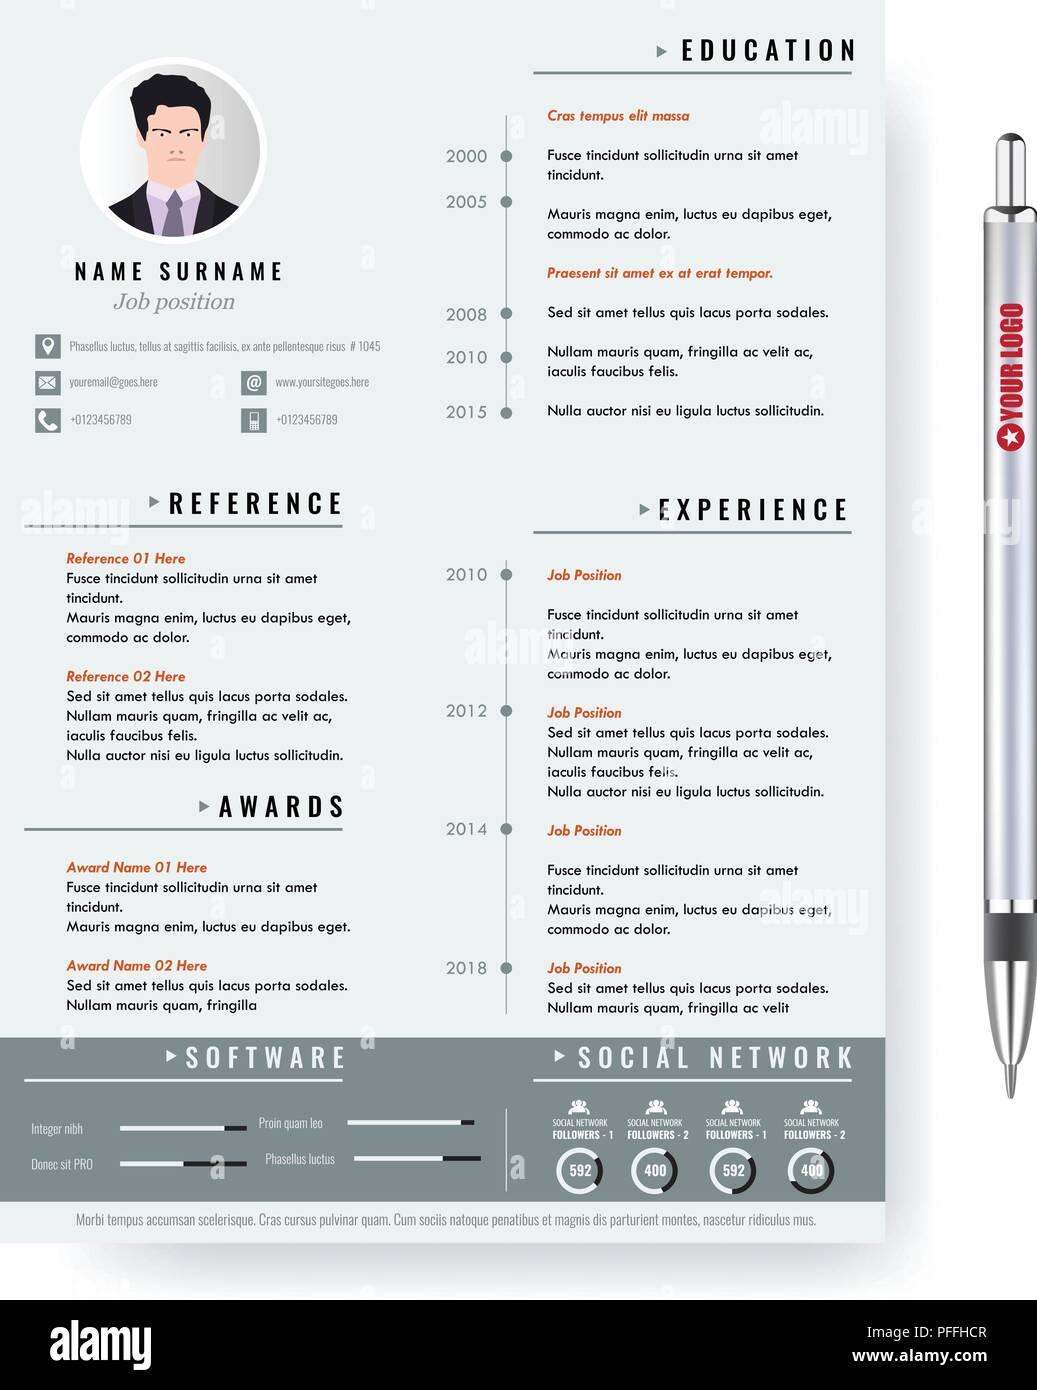 Resume Cv Curriculum Vitae Template Imágenes De Stock & Resume Cv ...